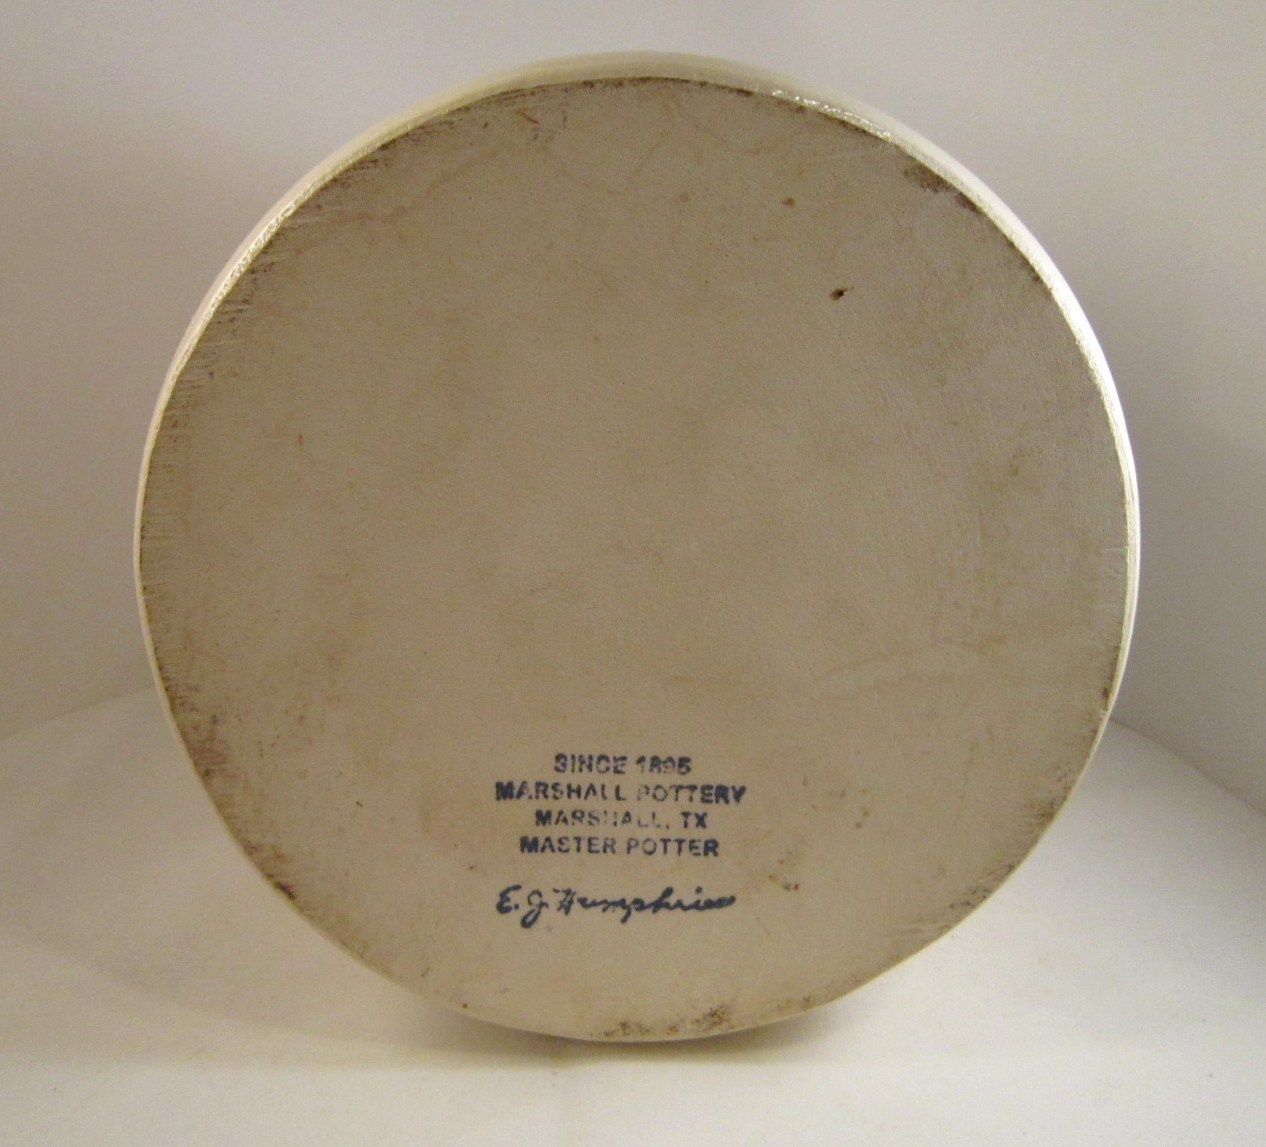 Marshall Pottery Gallon Jug, Handmade Texas Stoneware, Blue Stripe